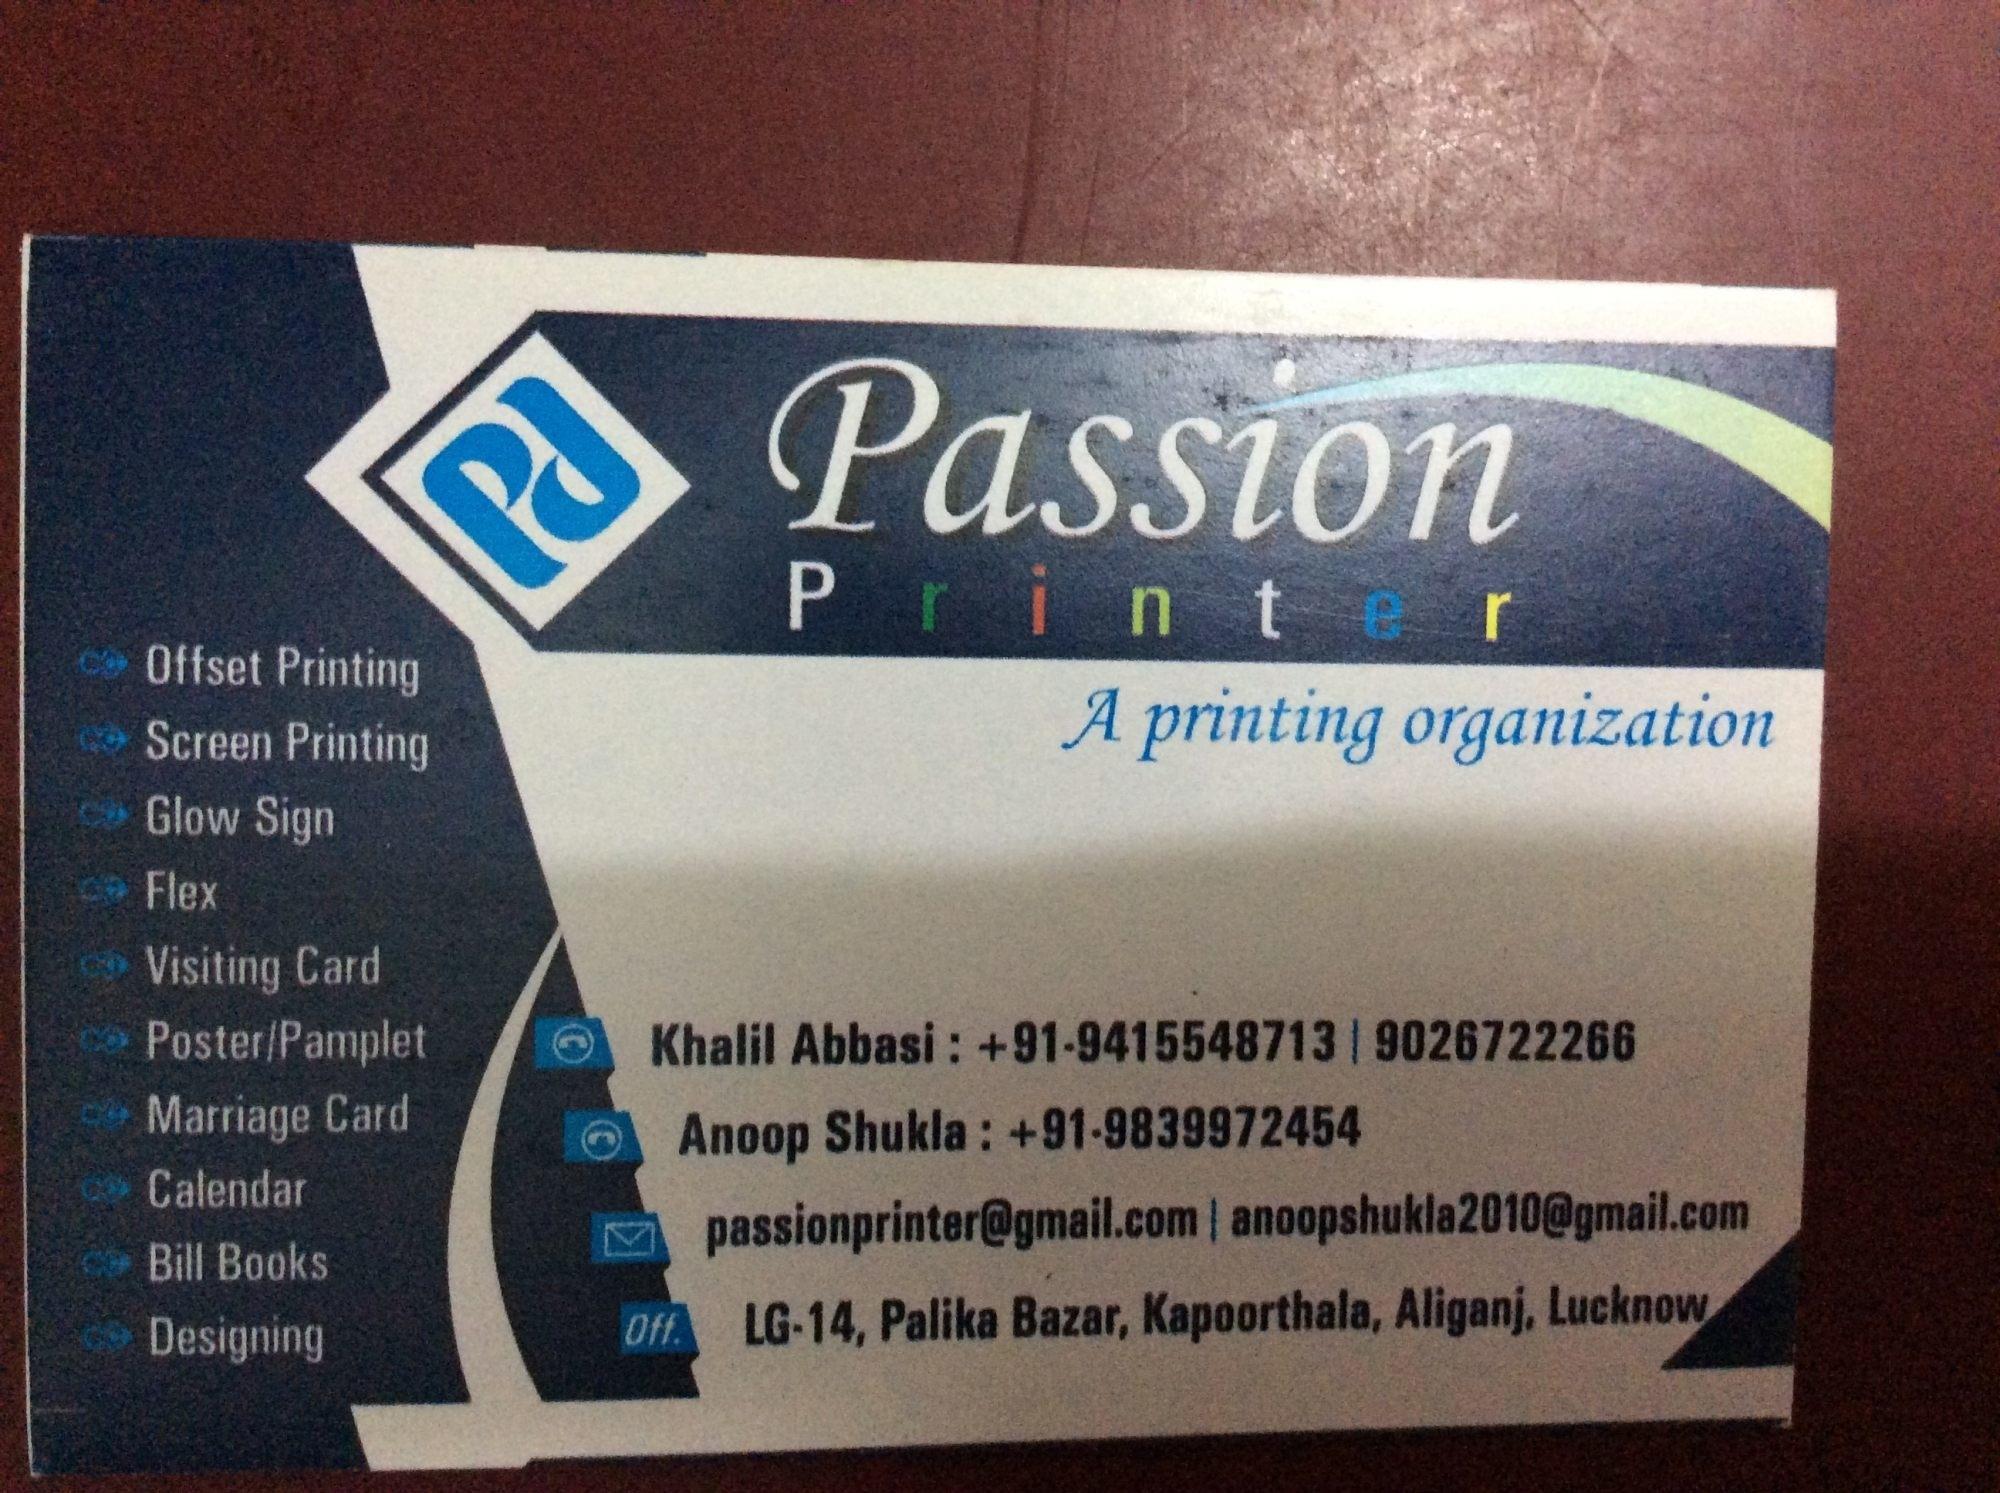 Mahi Printers, Aliganj - Printing Press In Lucknow - Justdial Calendar Printing In Lucknow